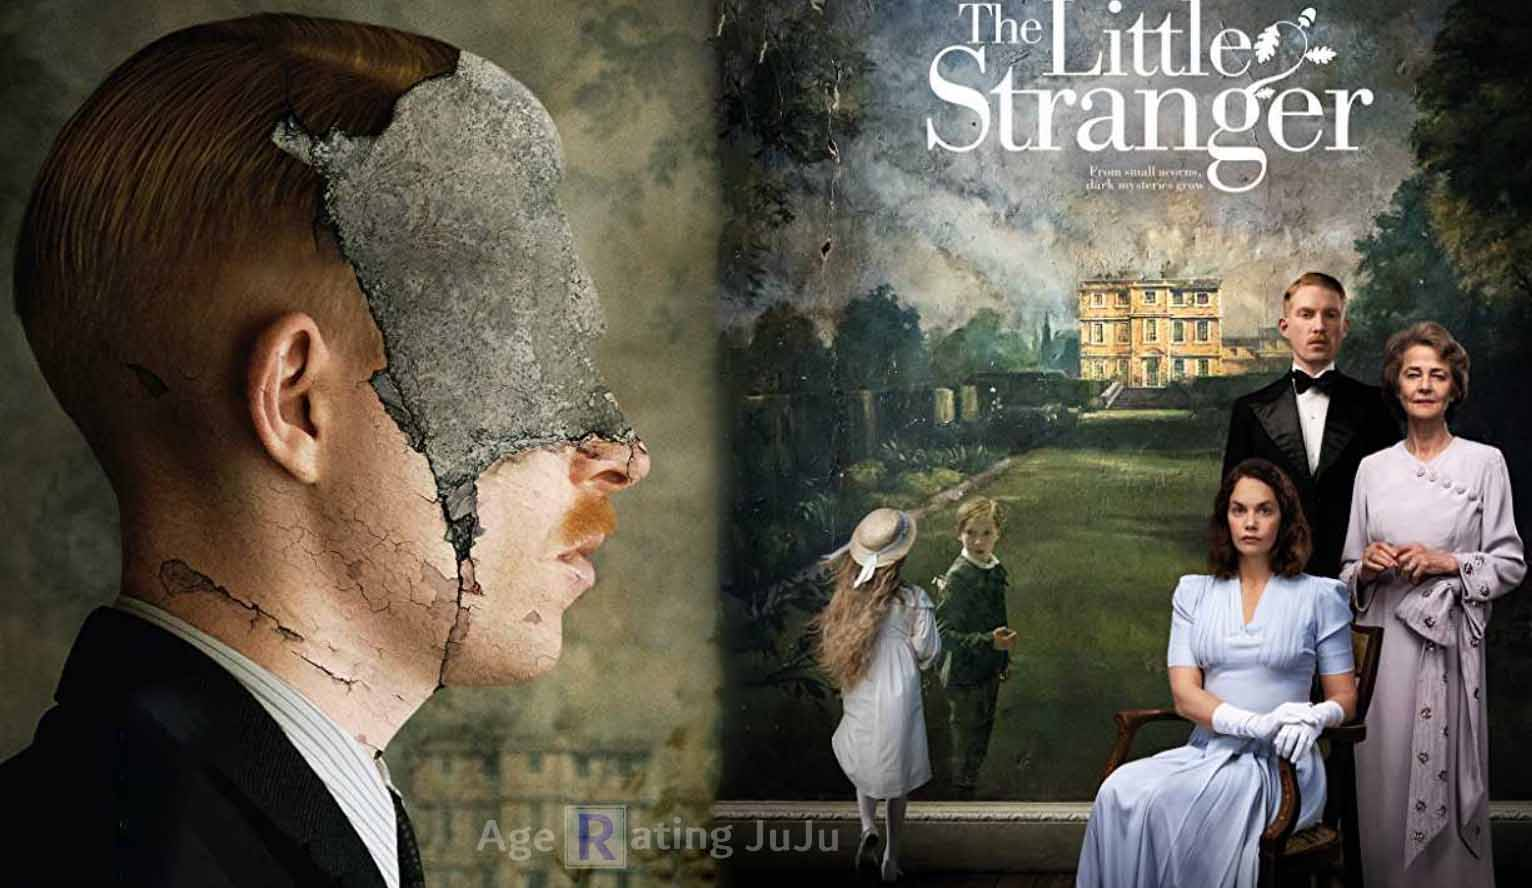 Movie Poster 2019: The Little Stranger Age Rating